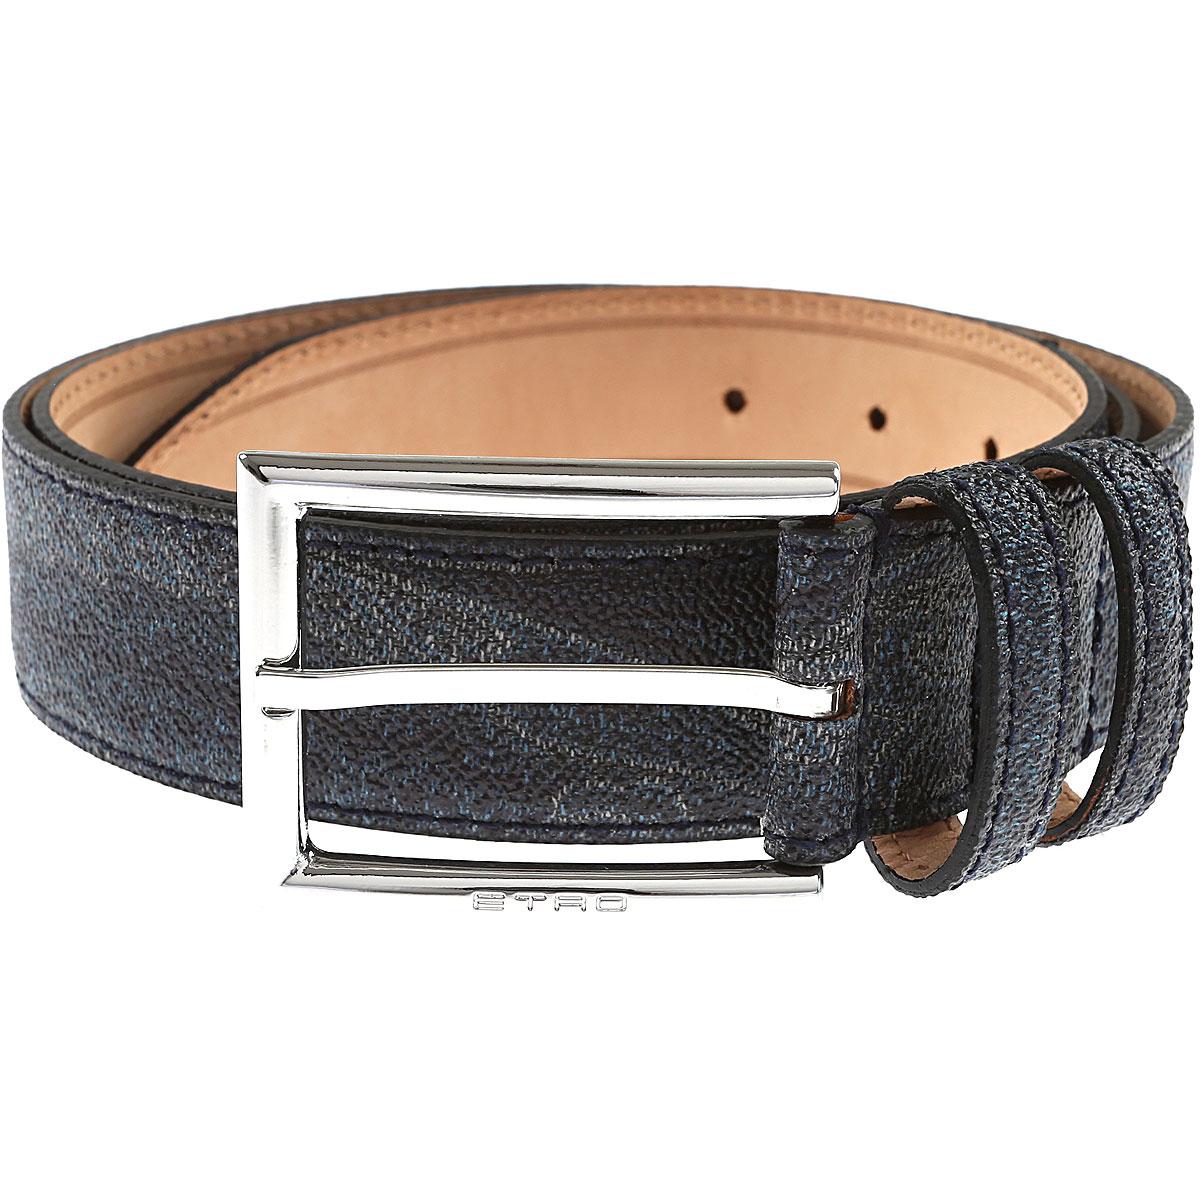 Image of Etro Belts, Bluette, Leather, 2017, 38 42 46